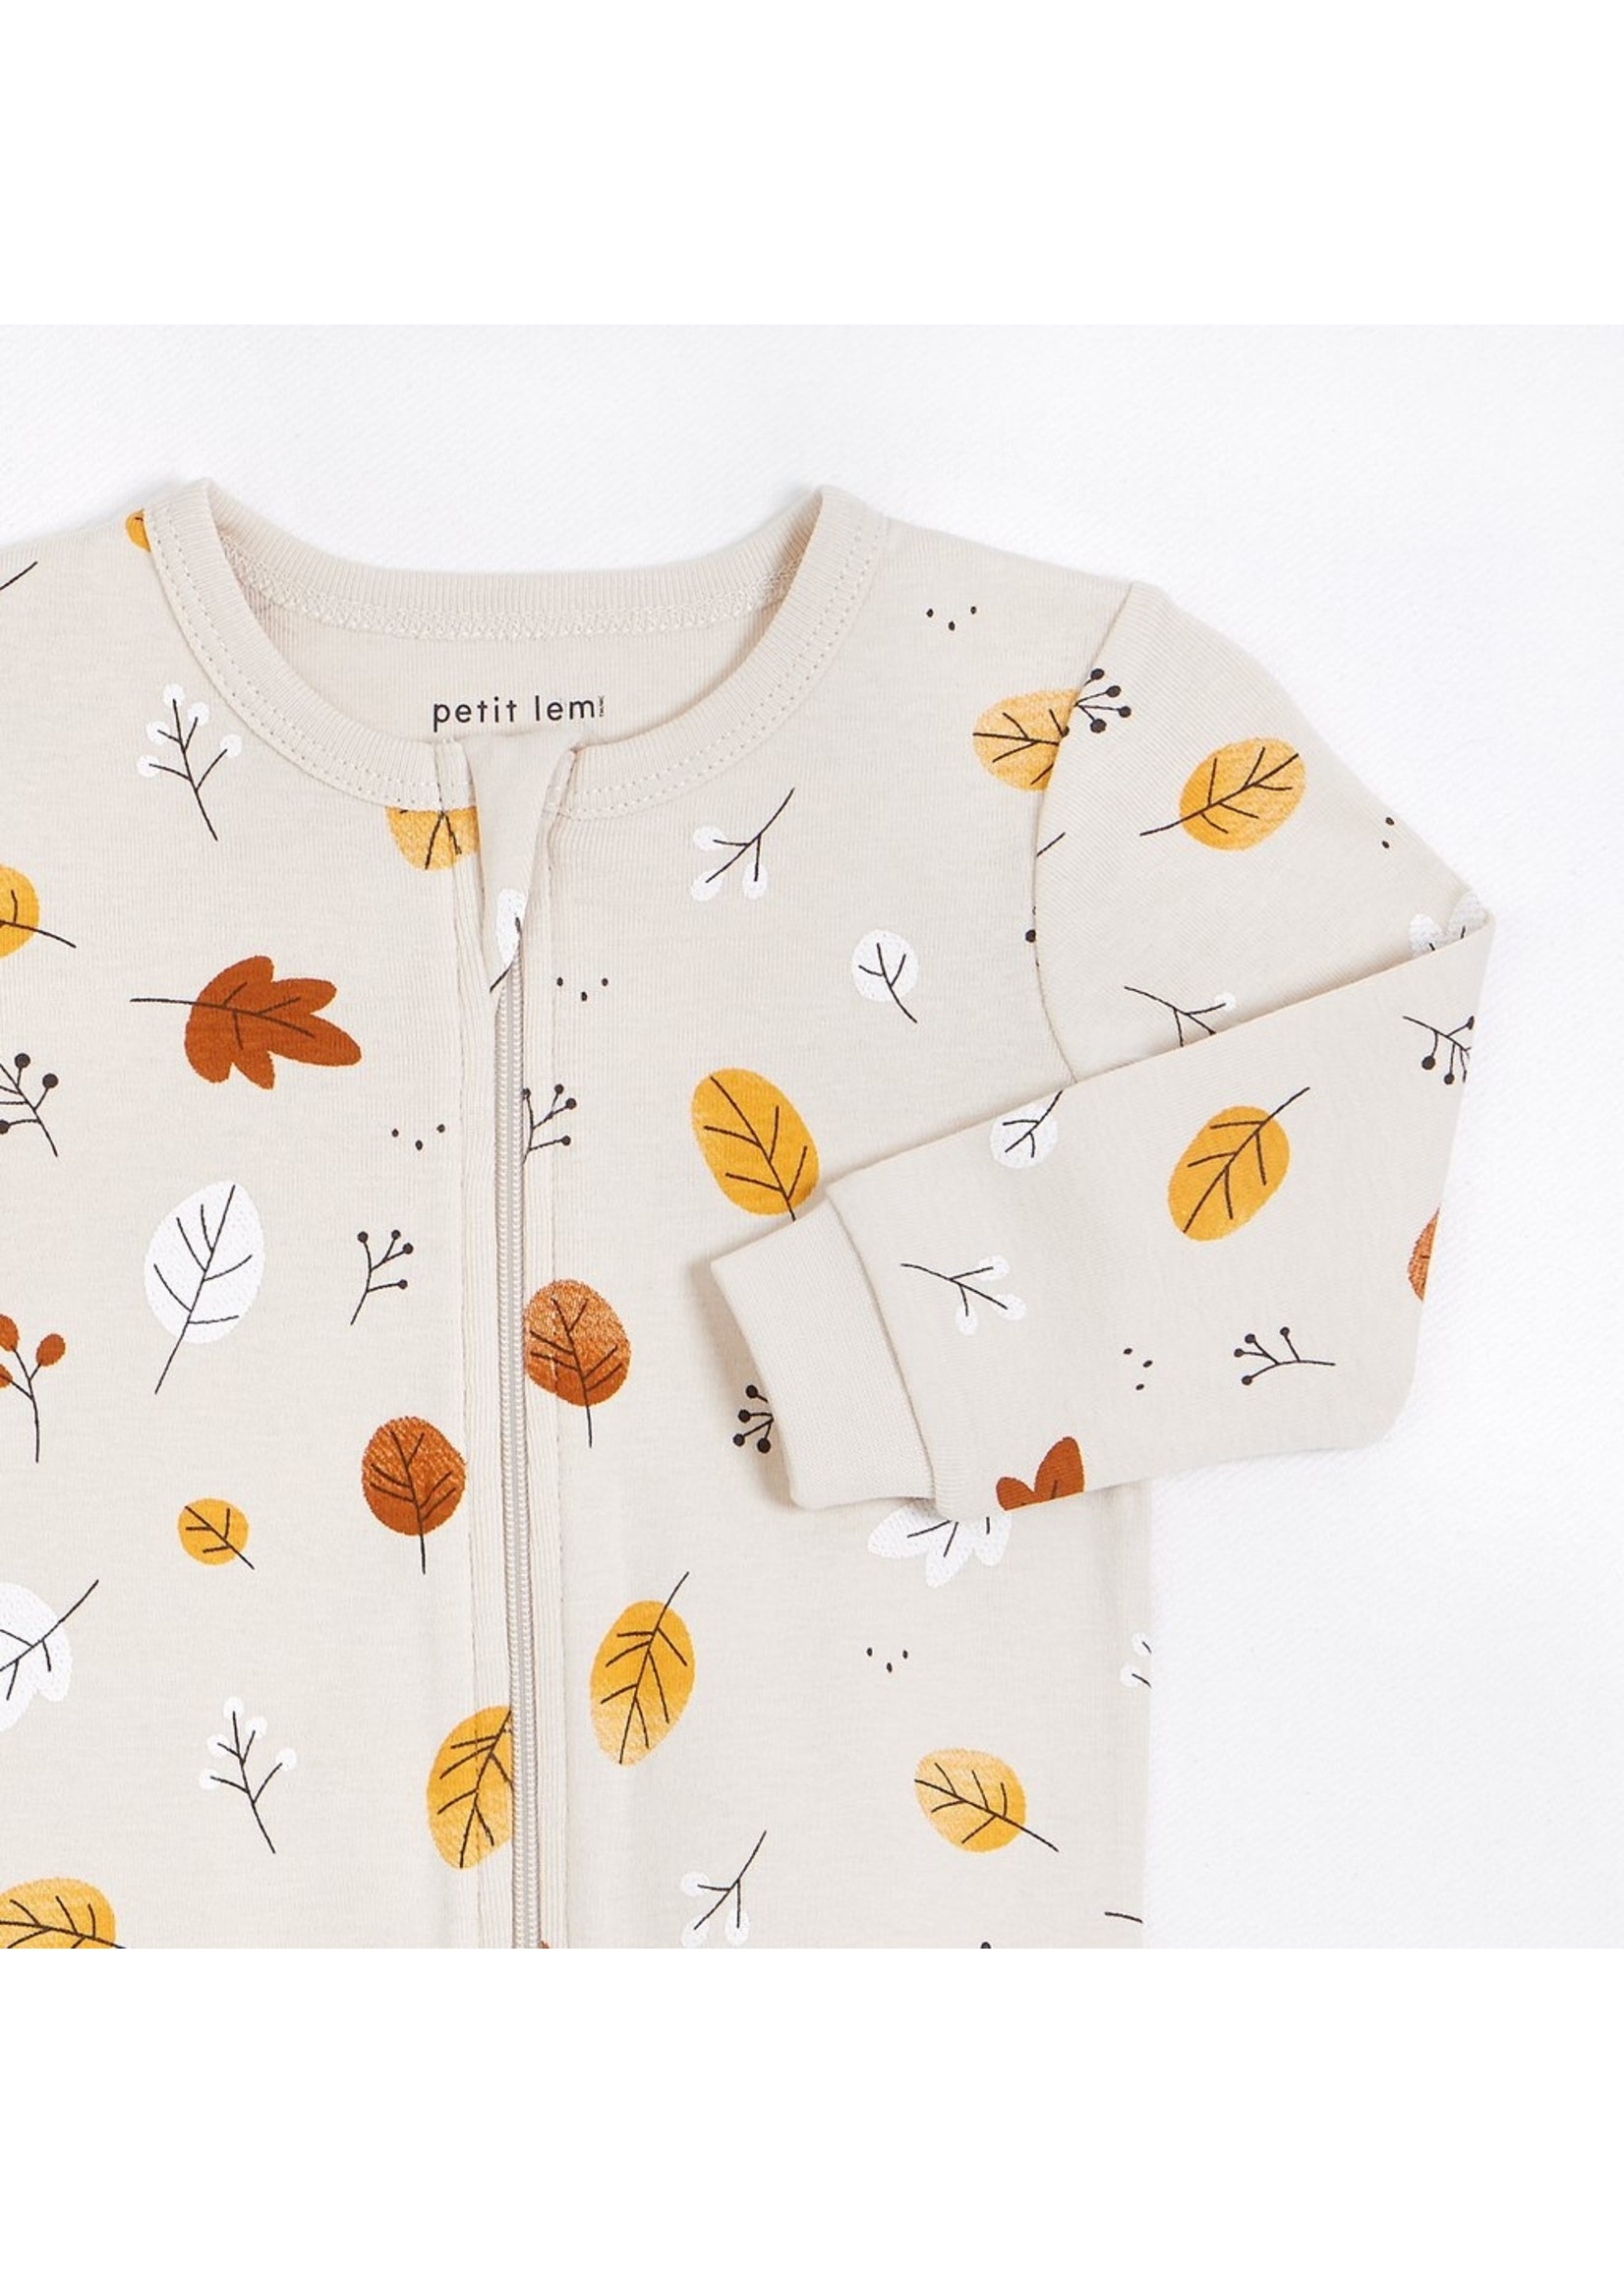 Petit Lem Pyjama 1 pièce Feuillage